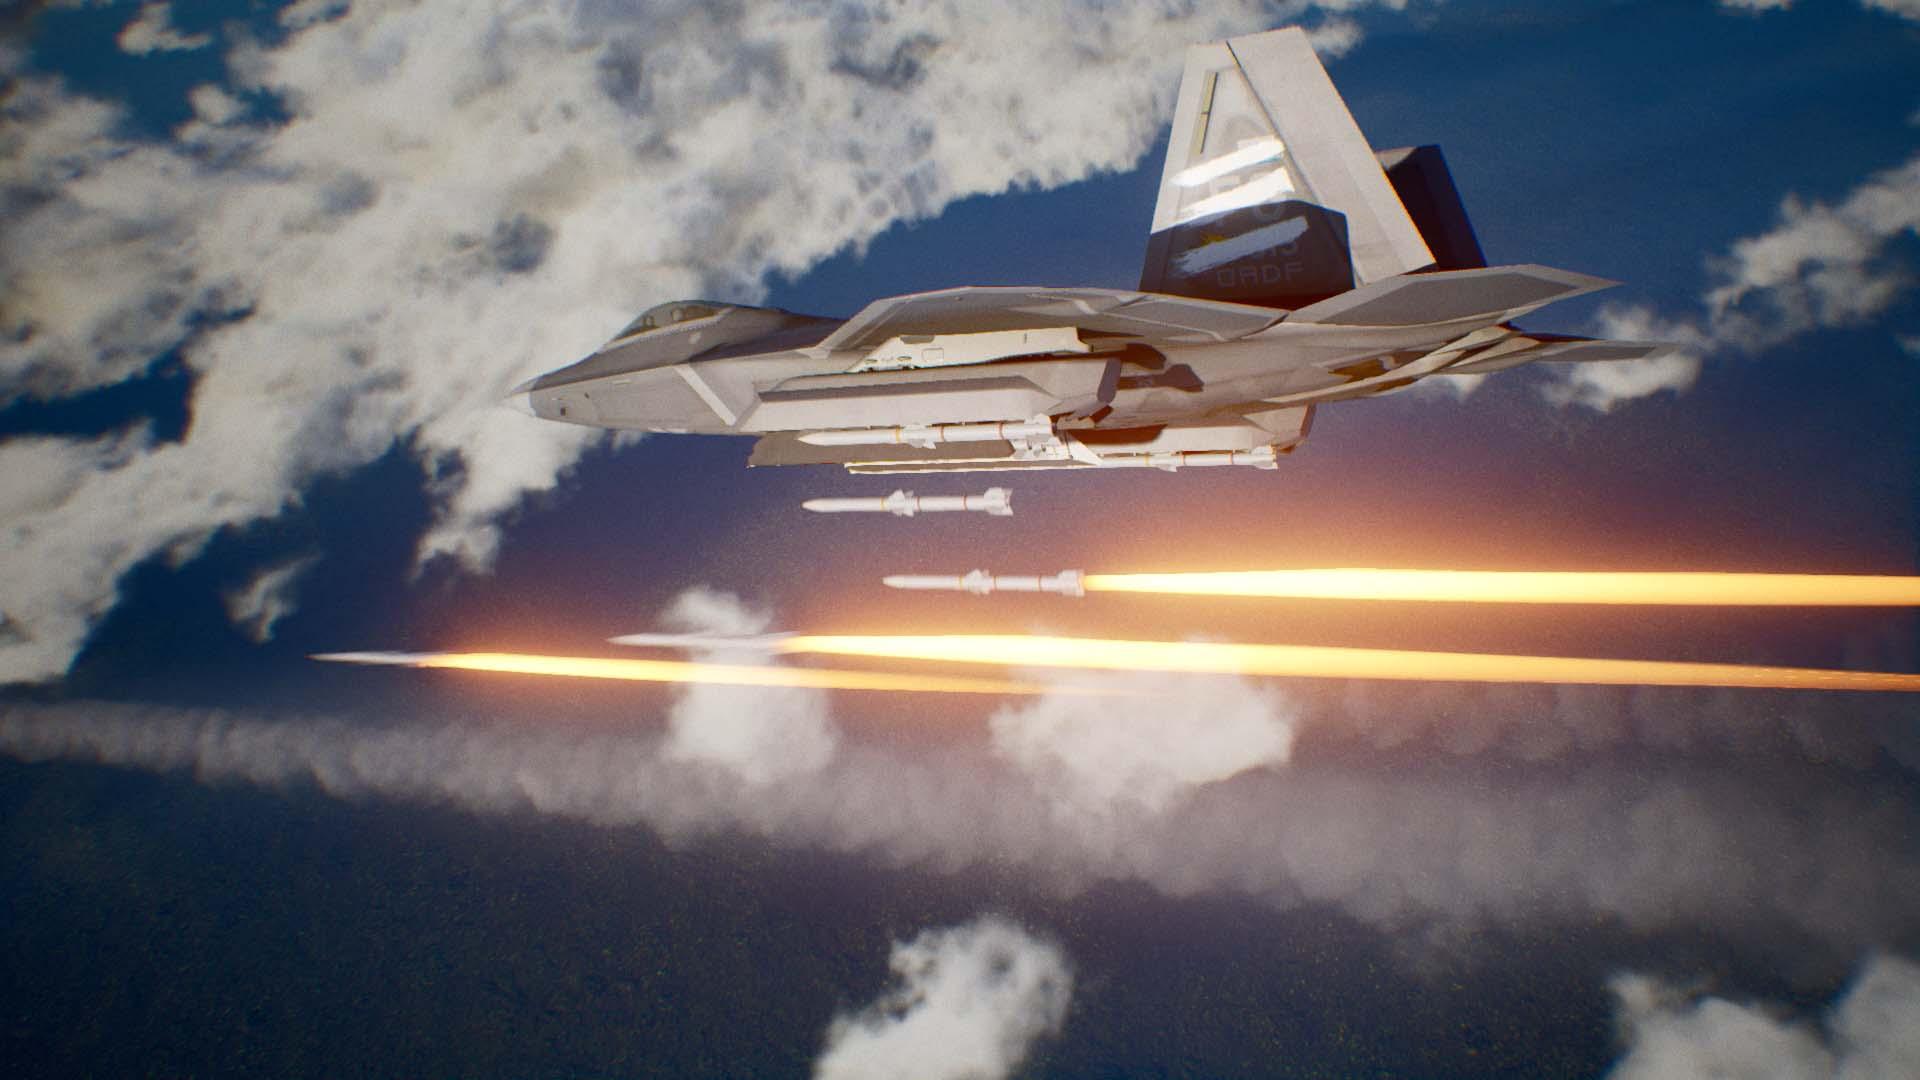 ace-combat-7-08-22-17-6.jpg